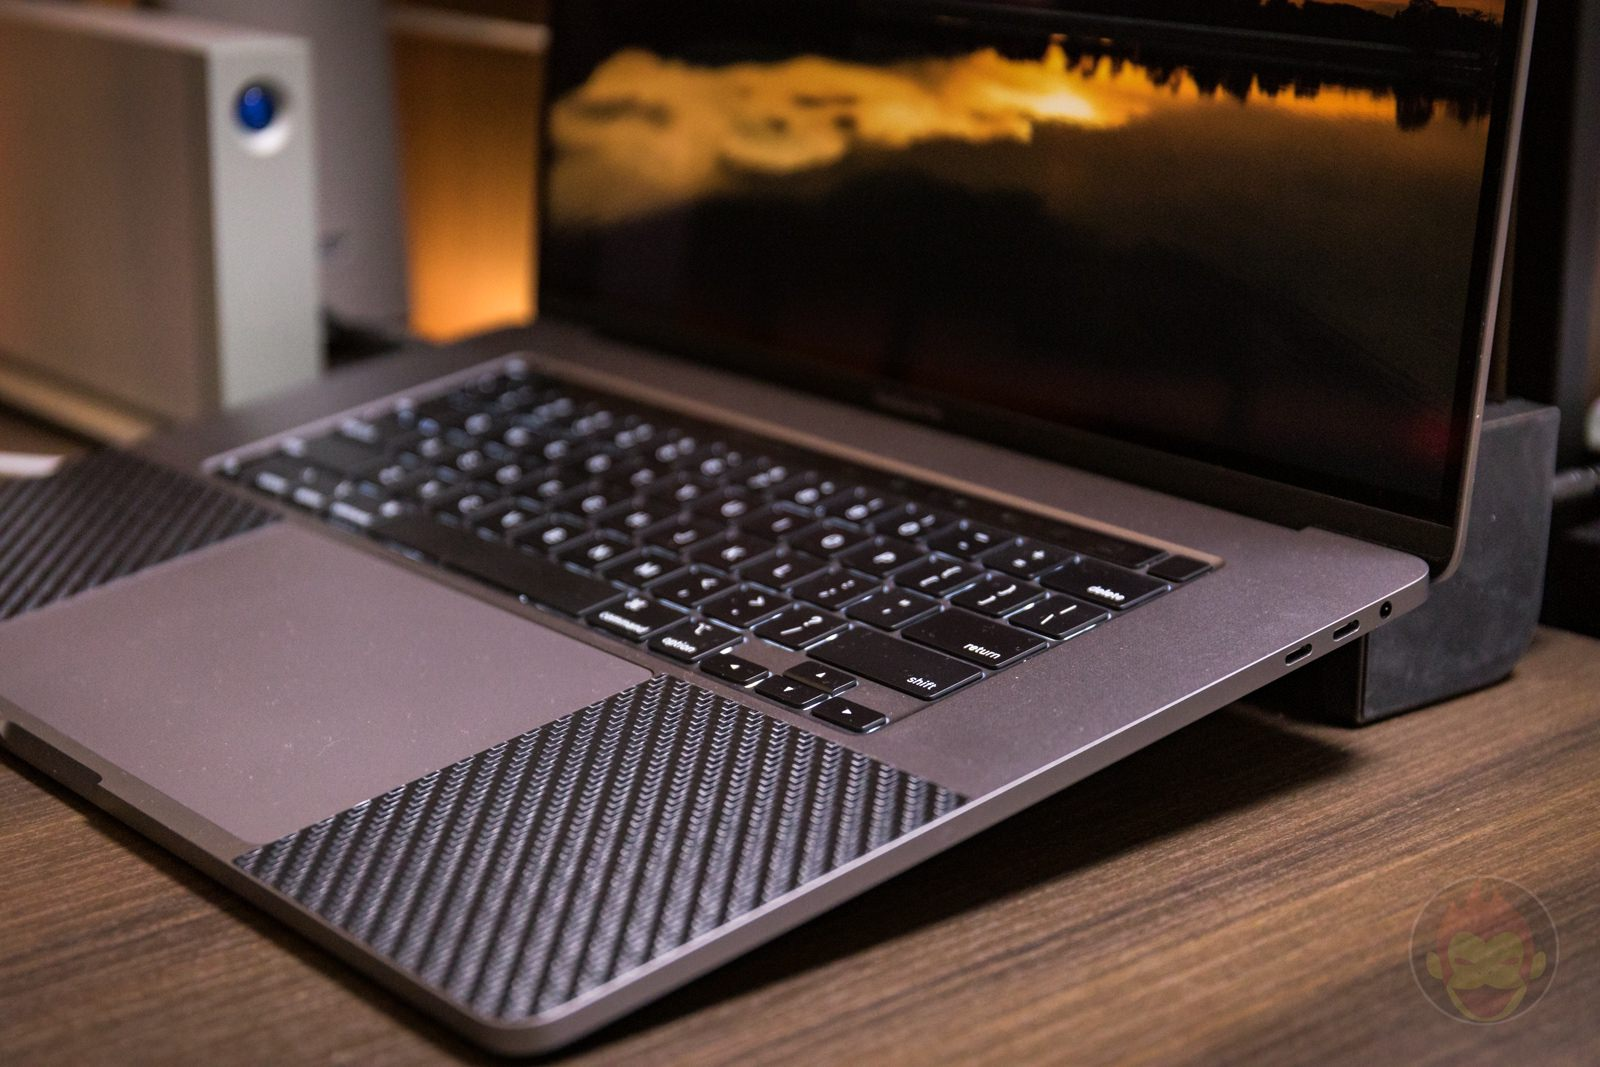 Using eGPU definately changes heat on MacBookPro 01